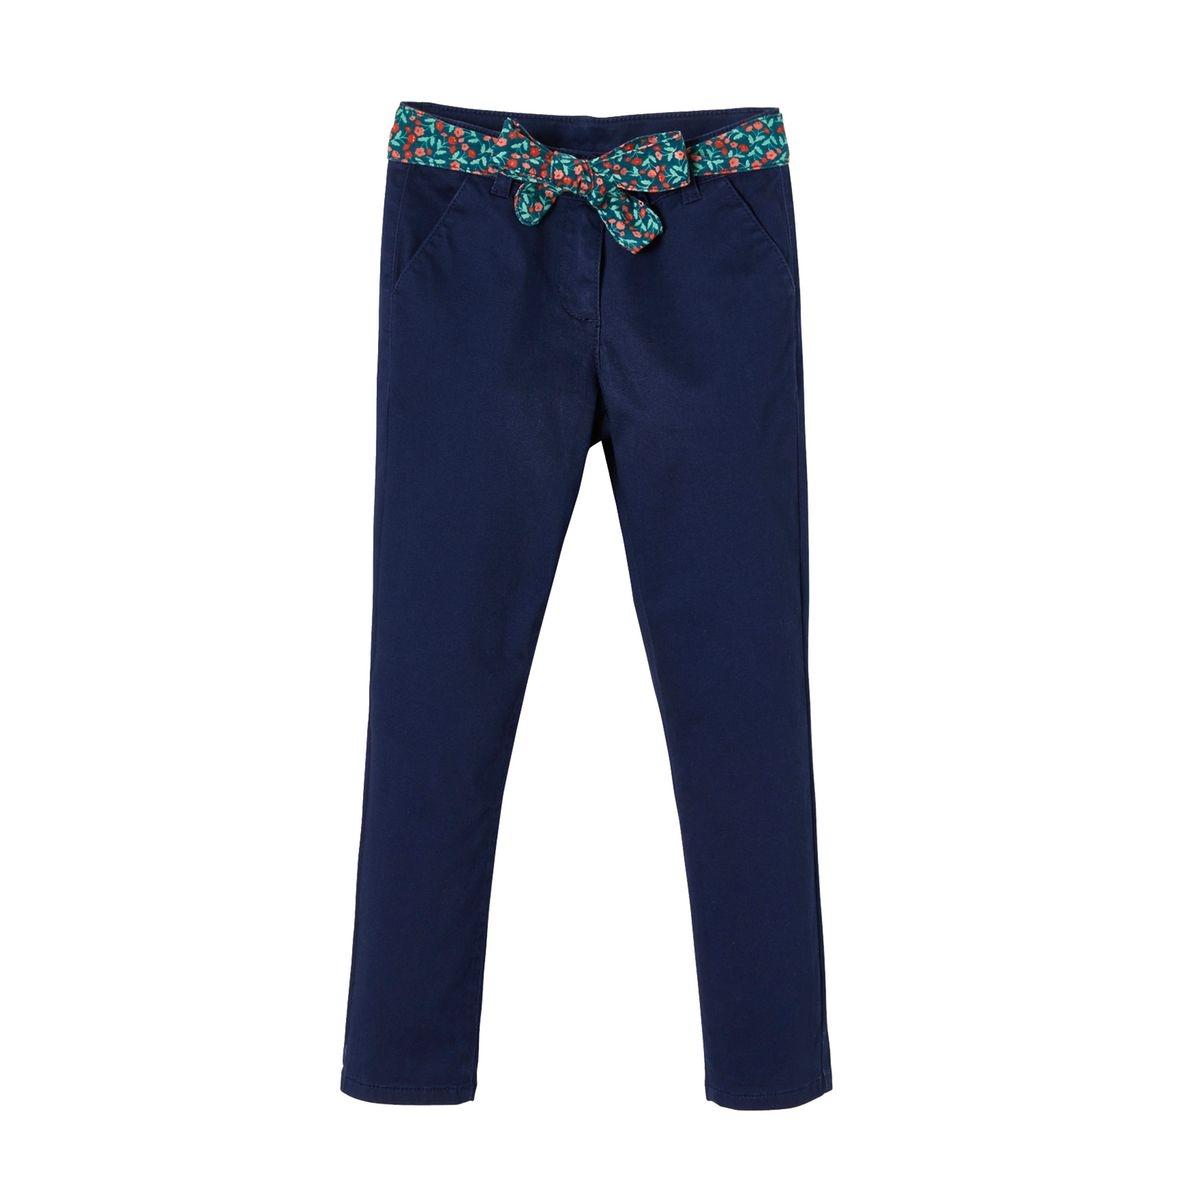 Pantalon chino avec ceinture foulard